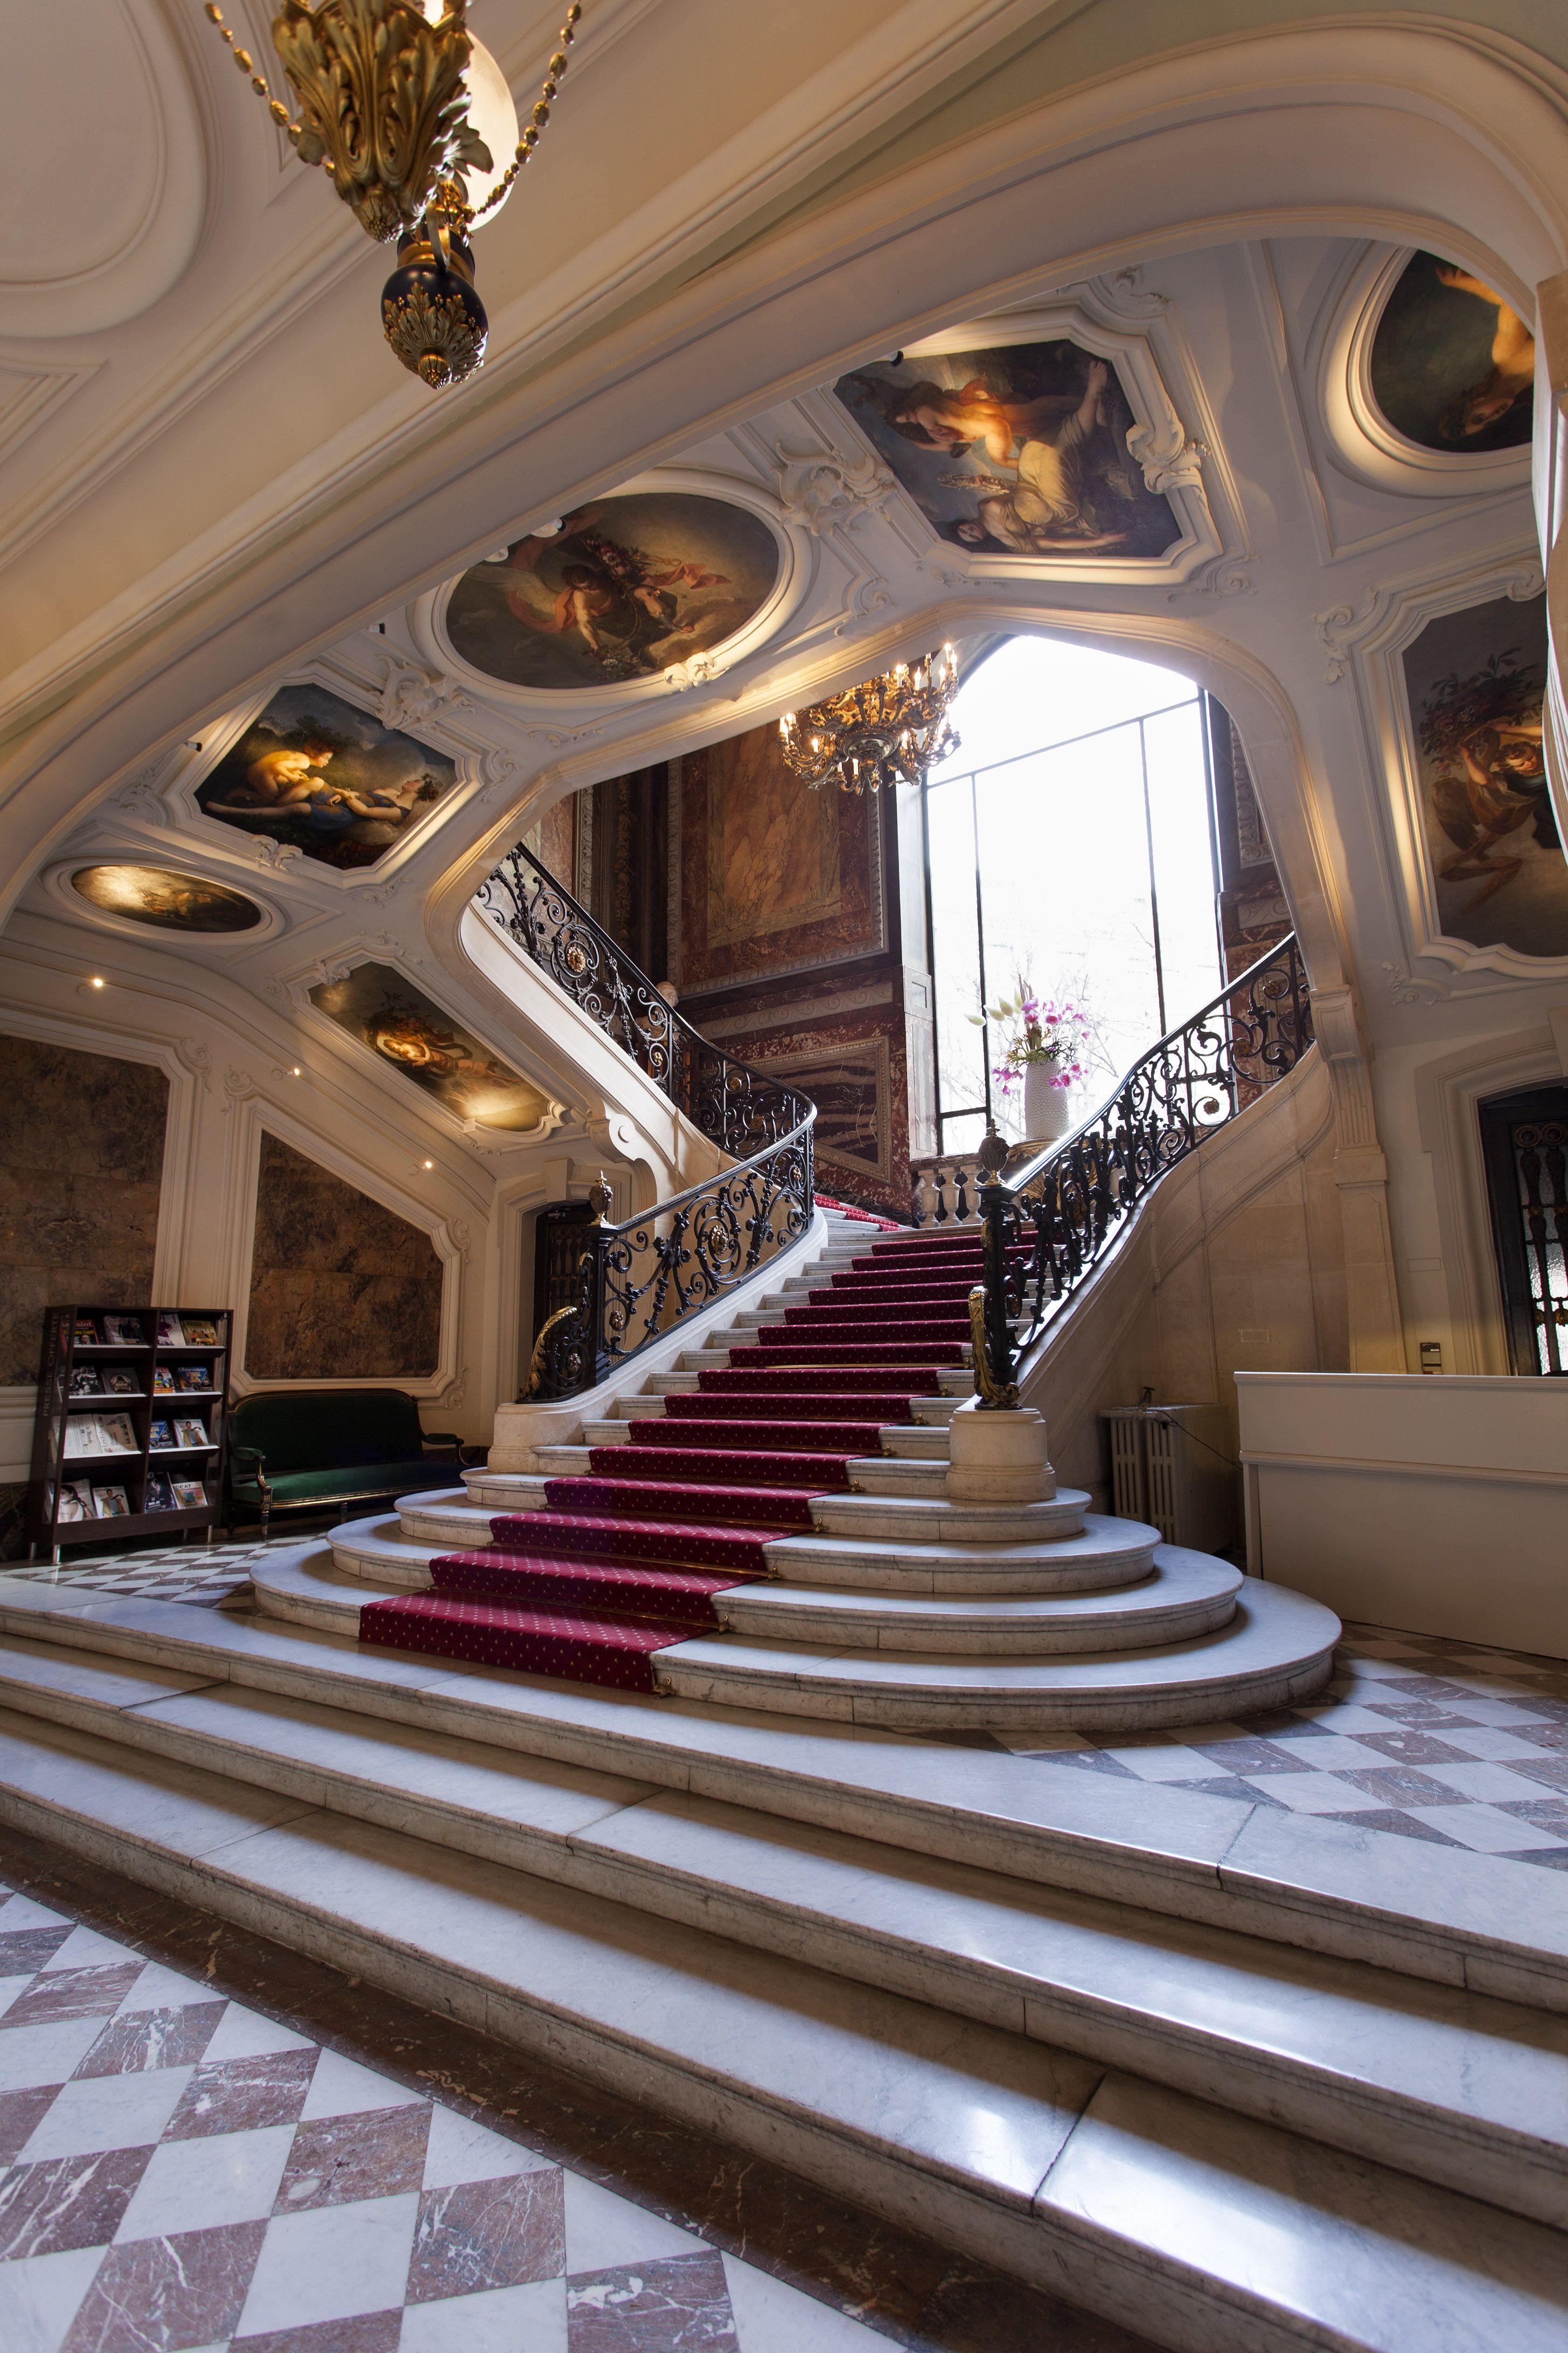 salons france am riques l 39 escalier monumental salons. Black Bedroom Furniture Sets. Home Design Ideas